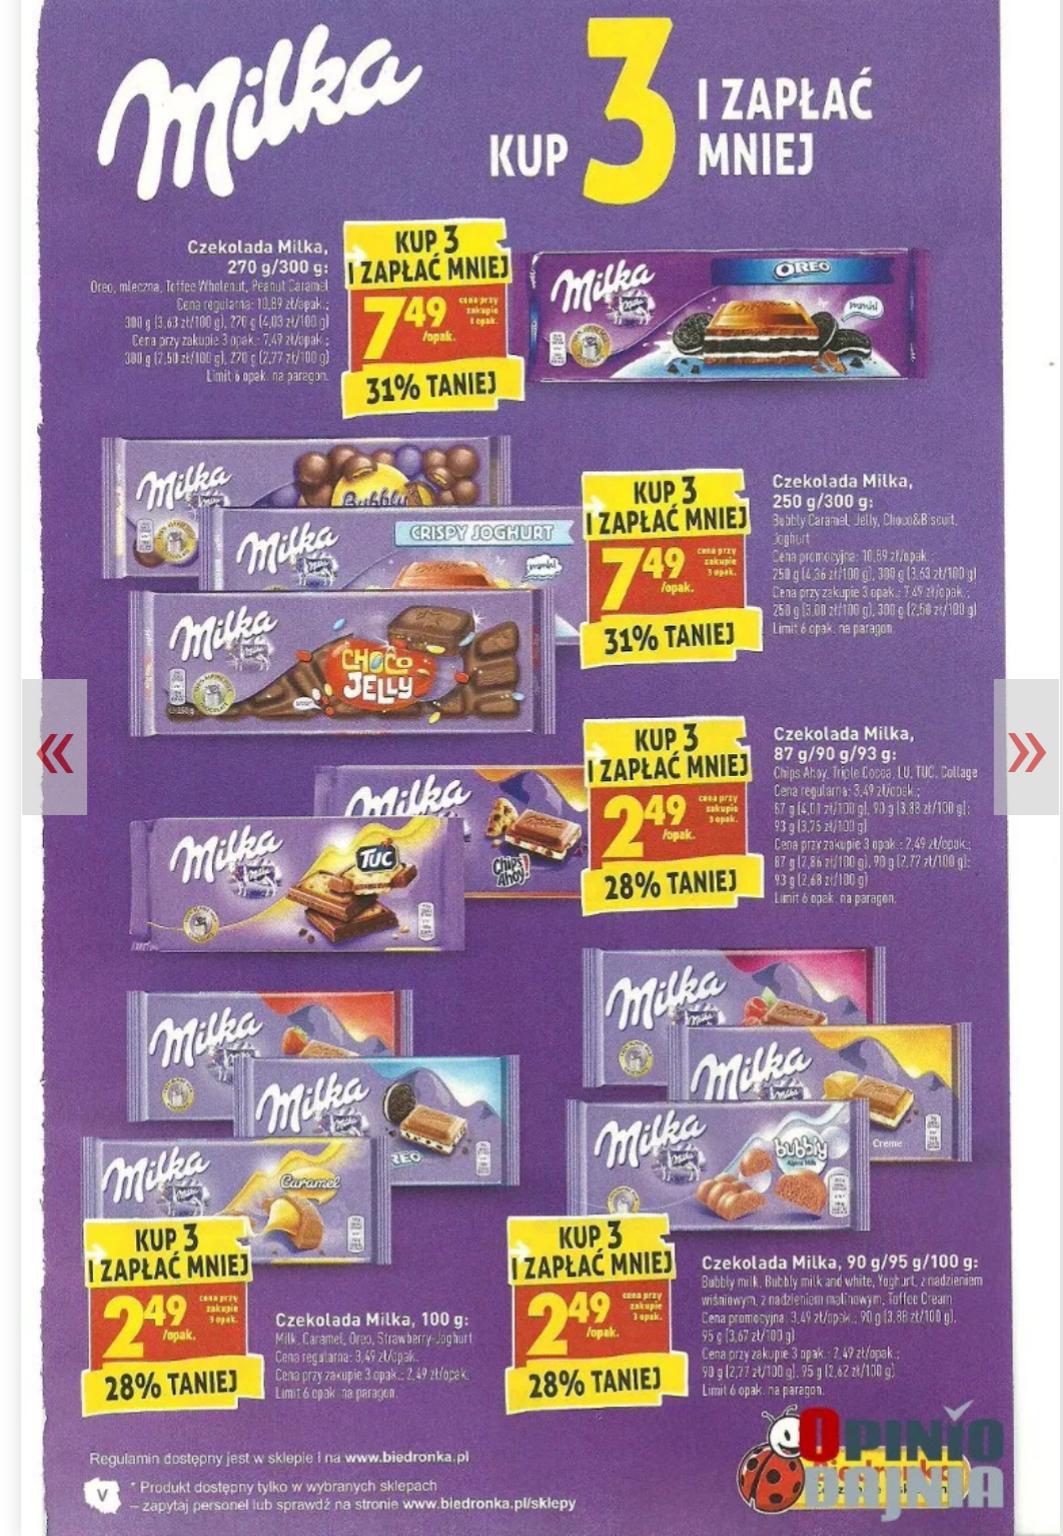 2 video coupon